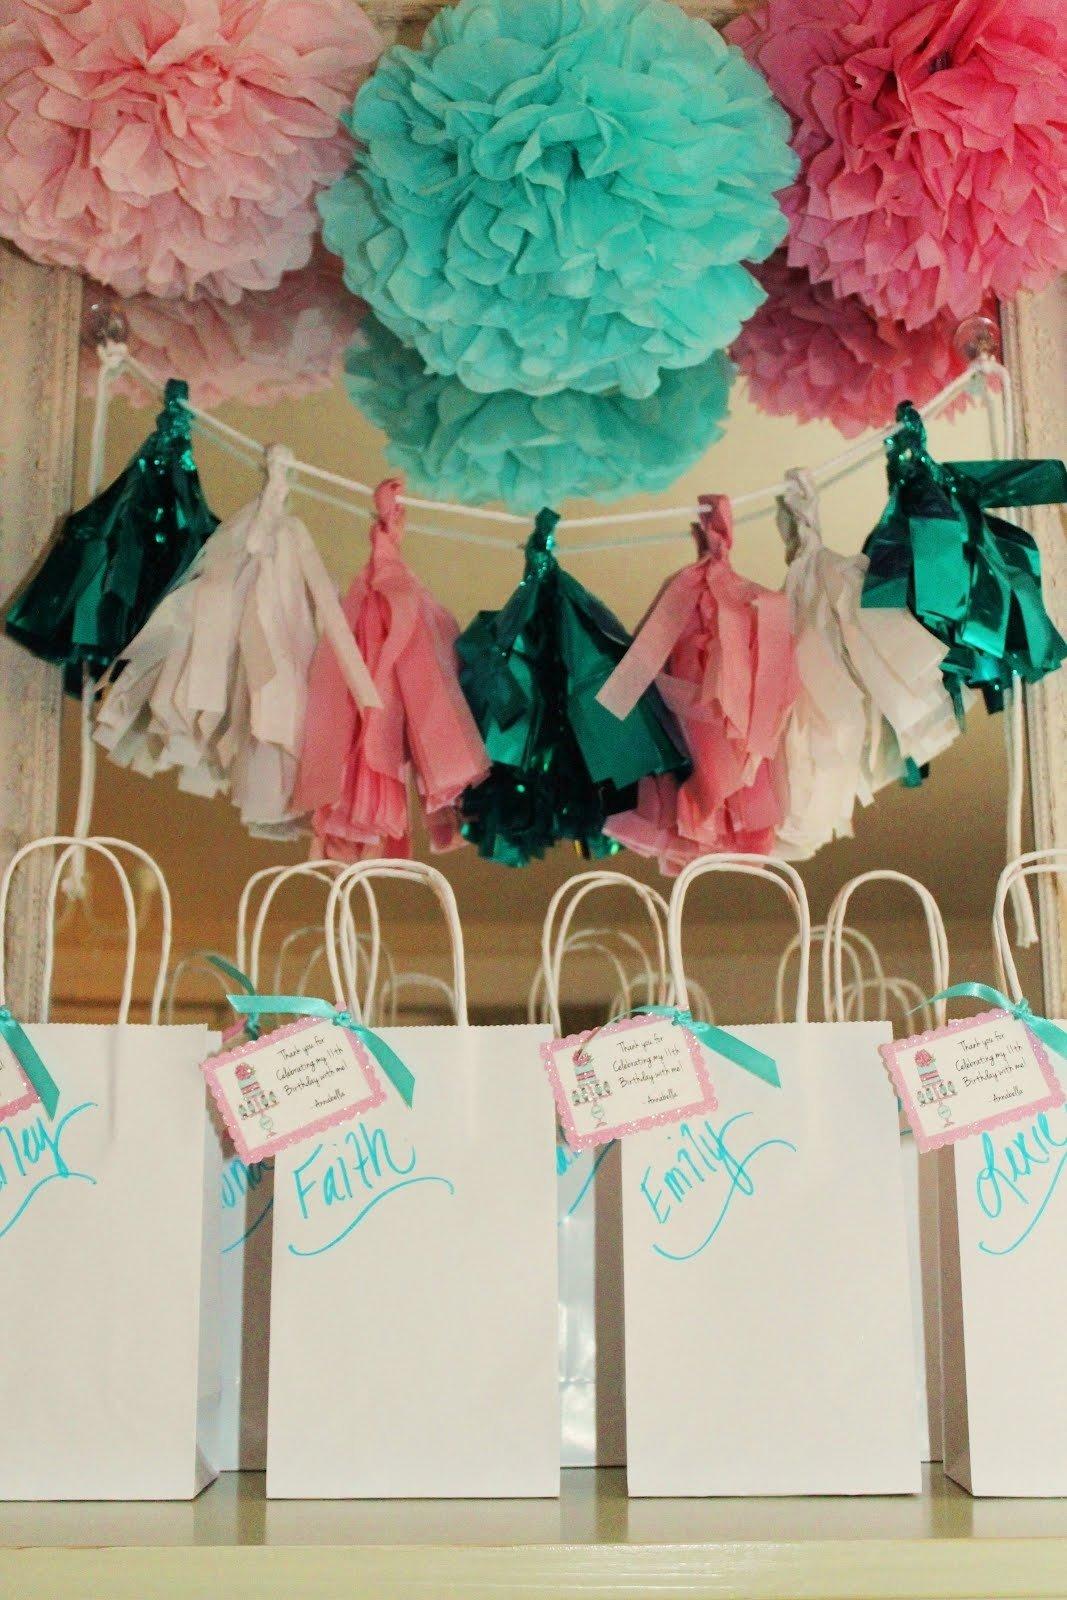 10 Cute 11 Year Old Birthday Ideas themes birthday 6 year old boy birthday party ideas at home in best 26